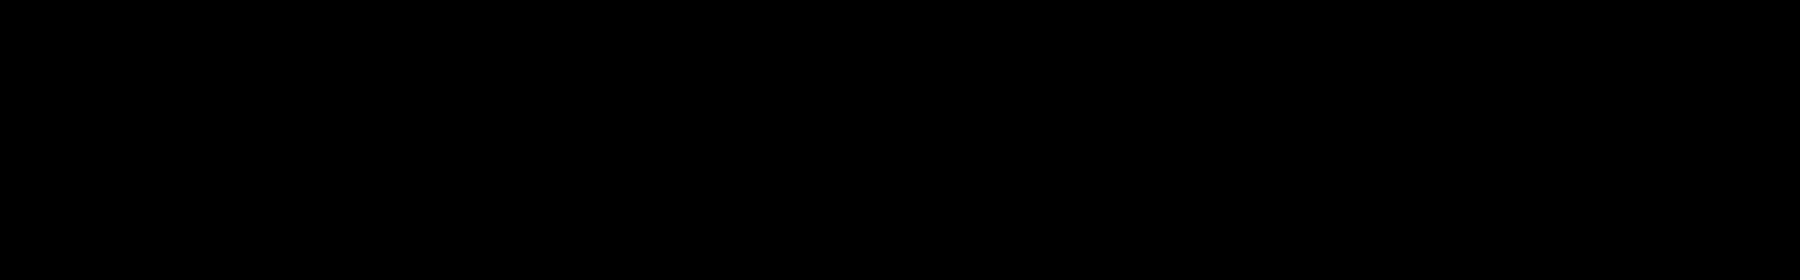 TECHNO Asteroid audio waveform